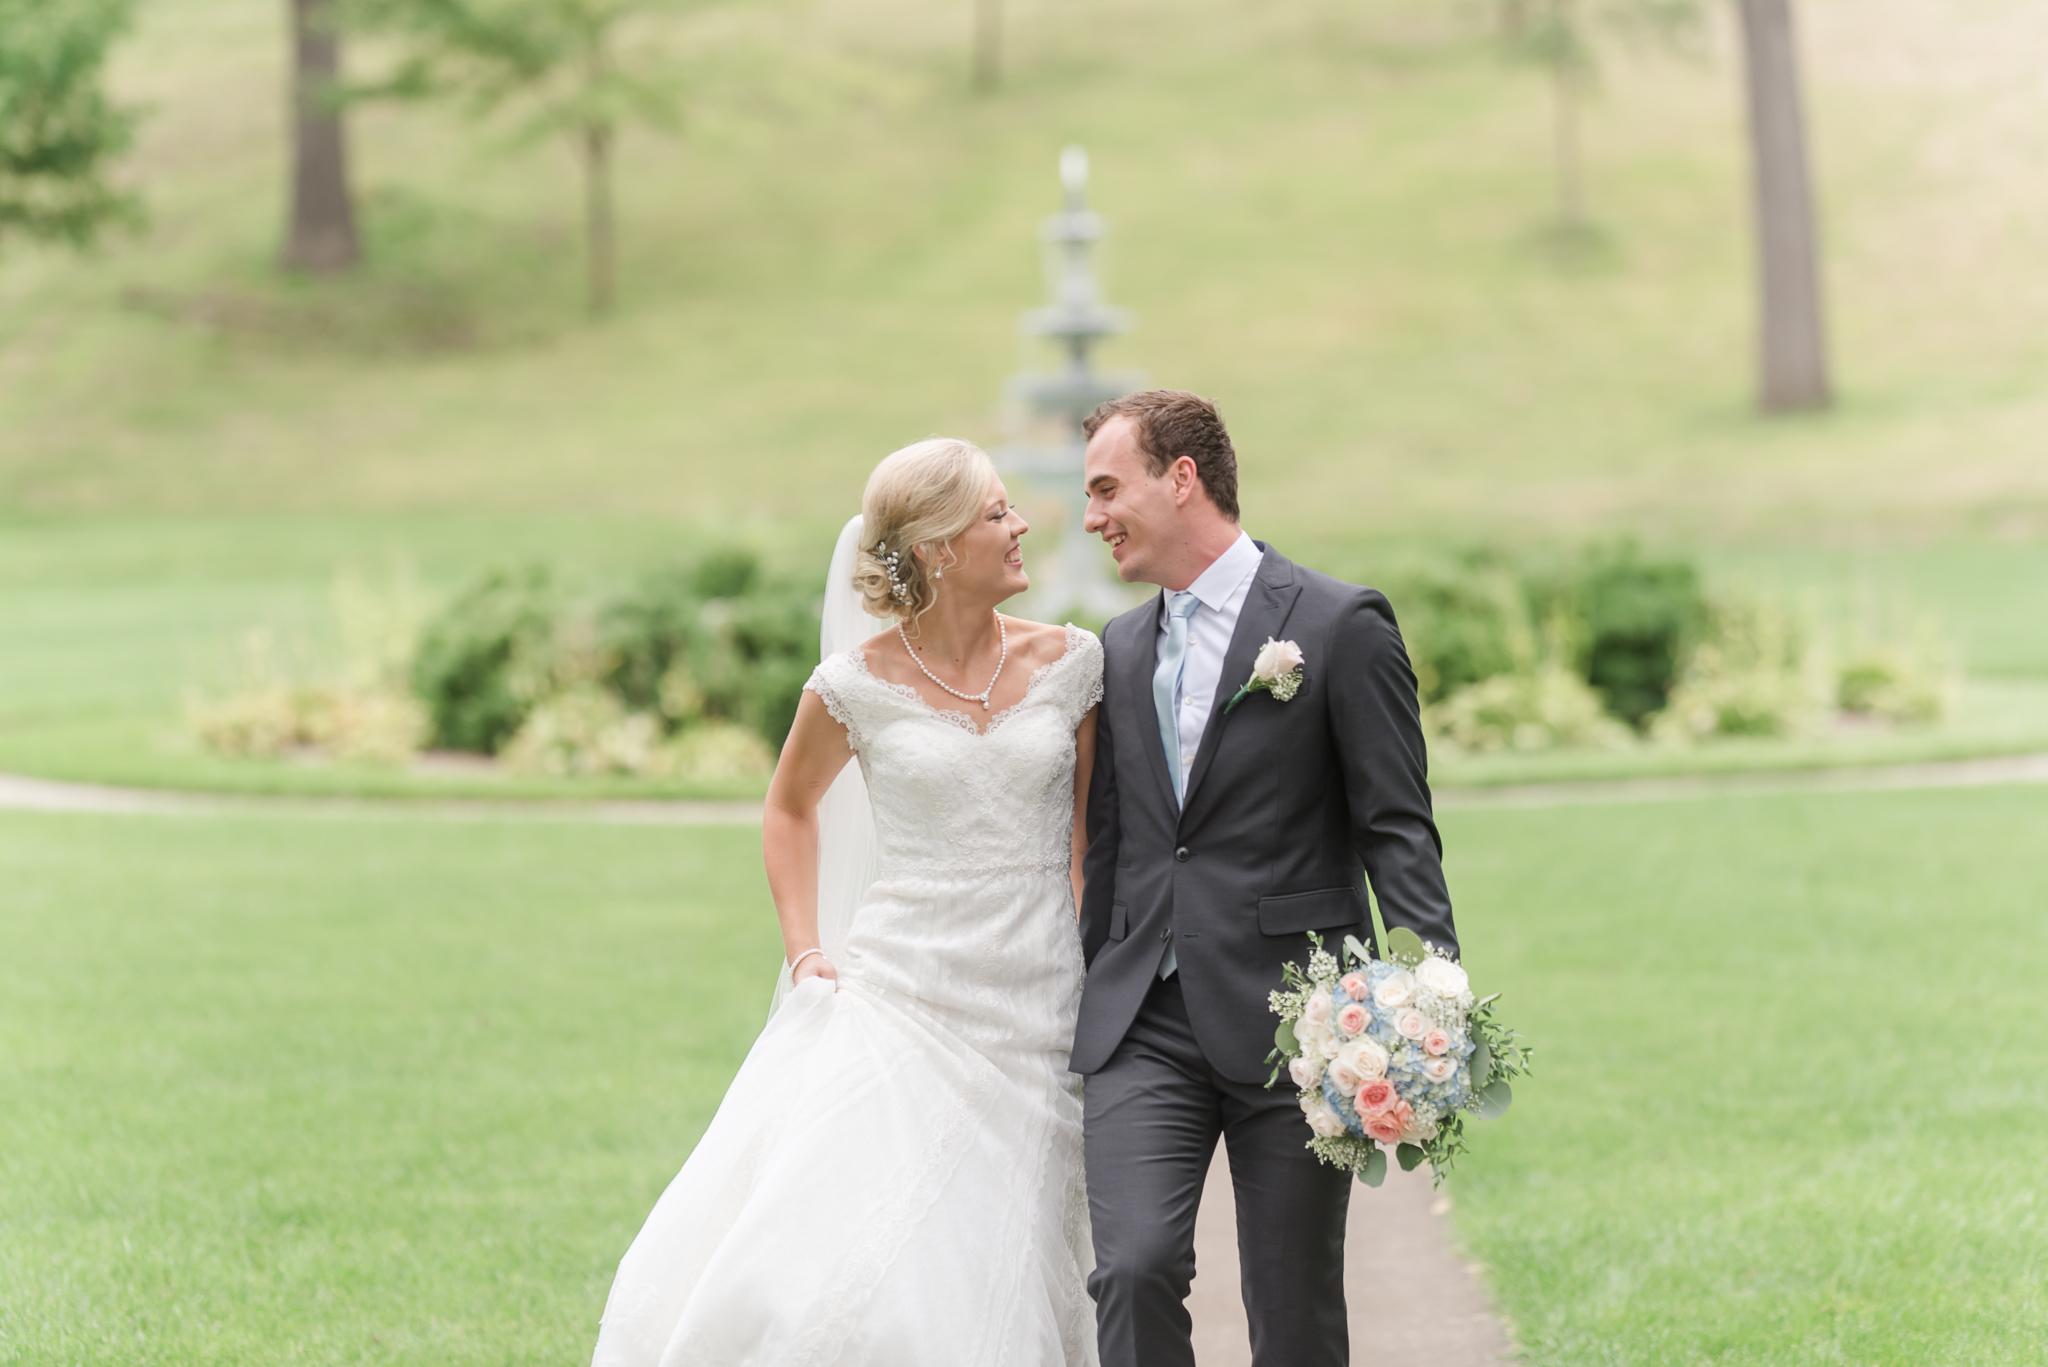 Westminister Hall Wedding Winona Lake Indiana8878.jpg